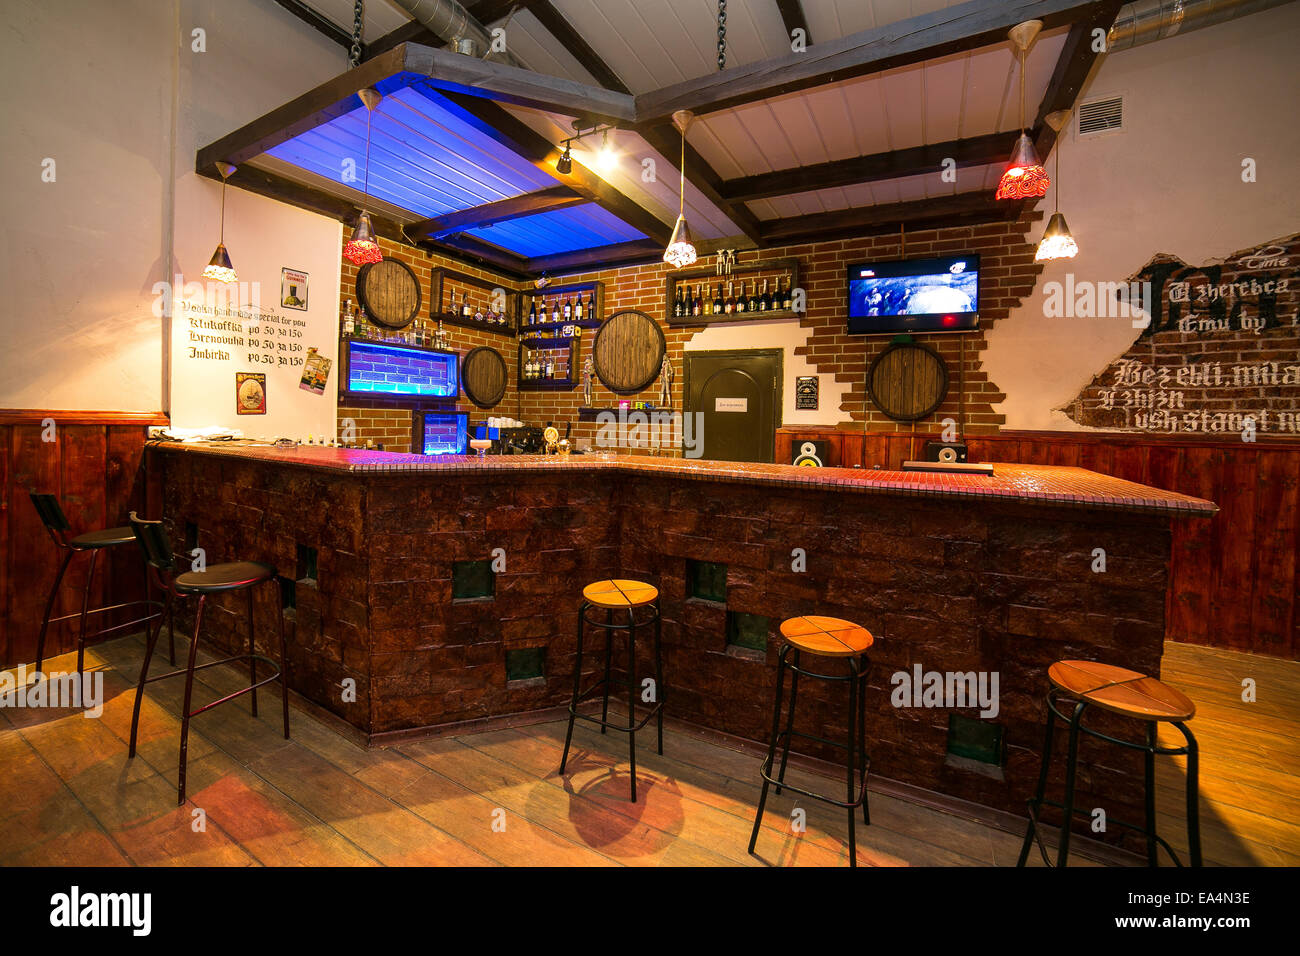 Bar Counter At Style Hotel Stockfotos & Bar Counter At Style Hotel ...